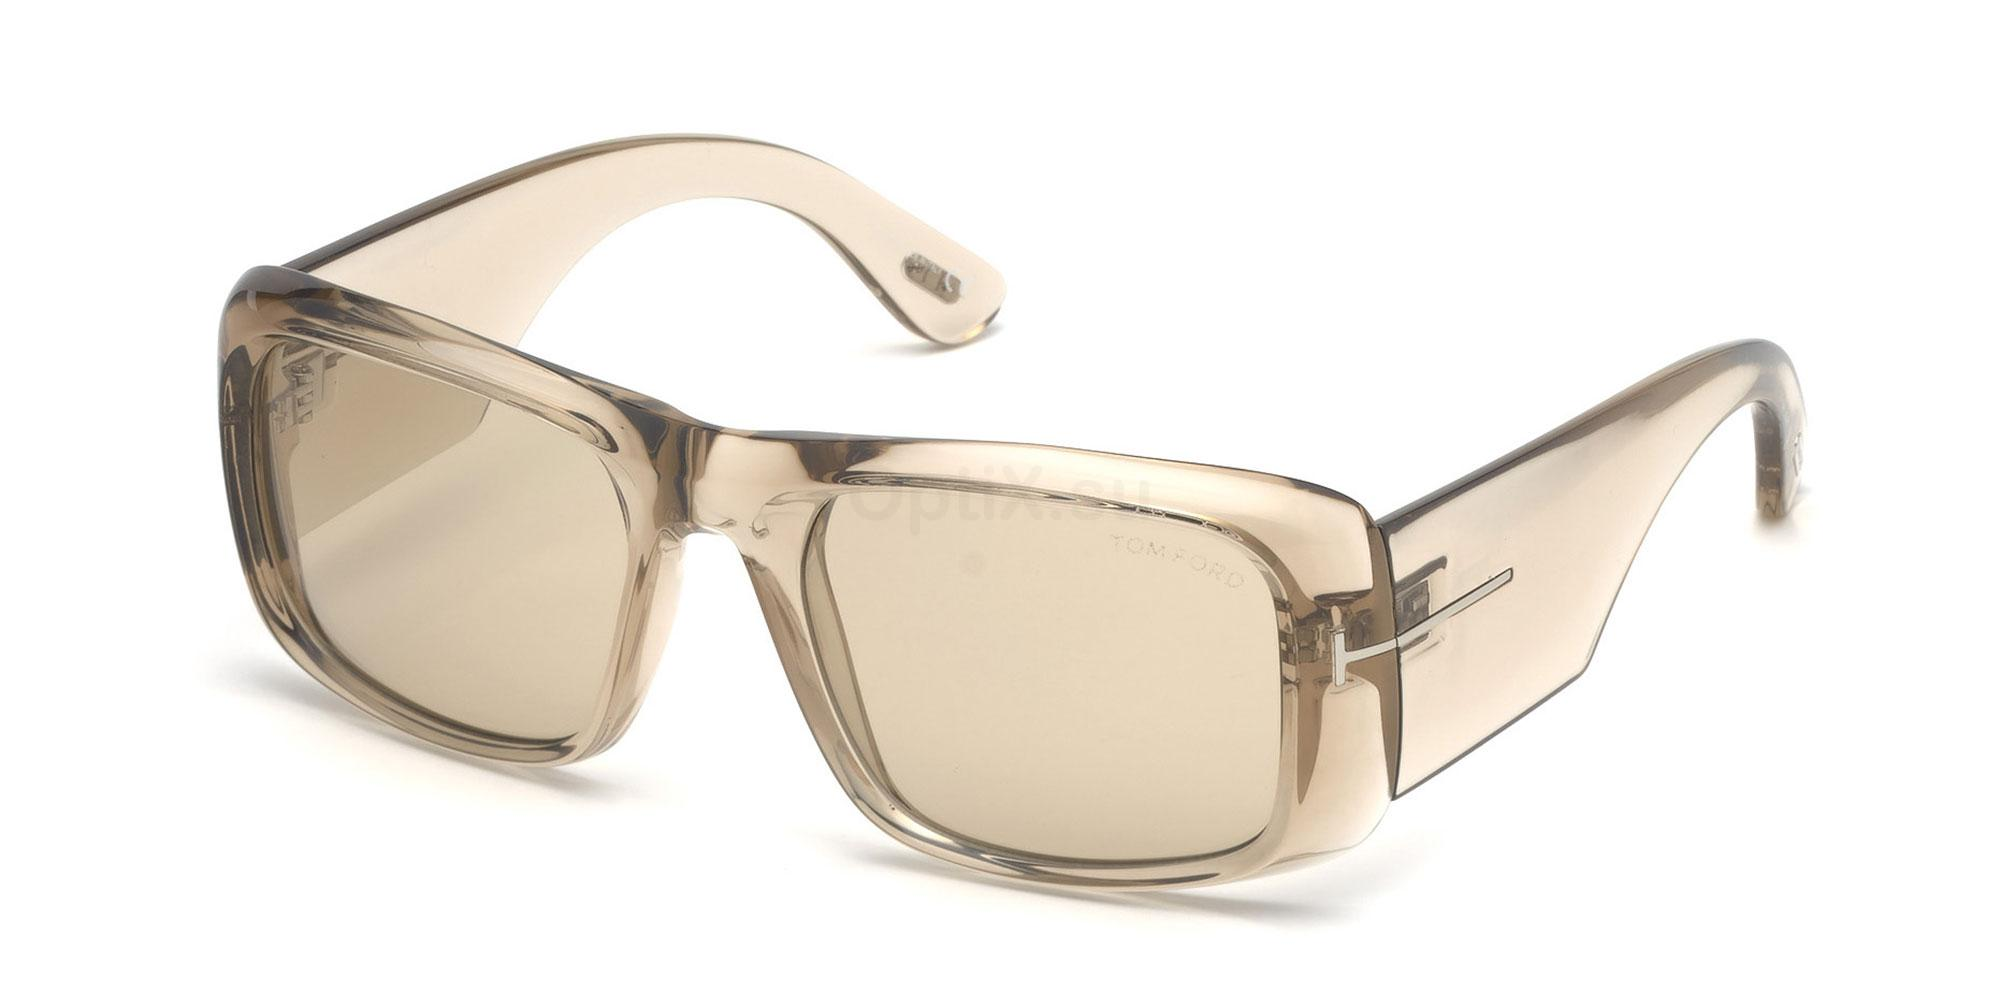 20A FT0731 Sunglasses, Tom Ford